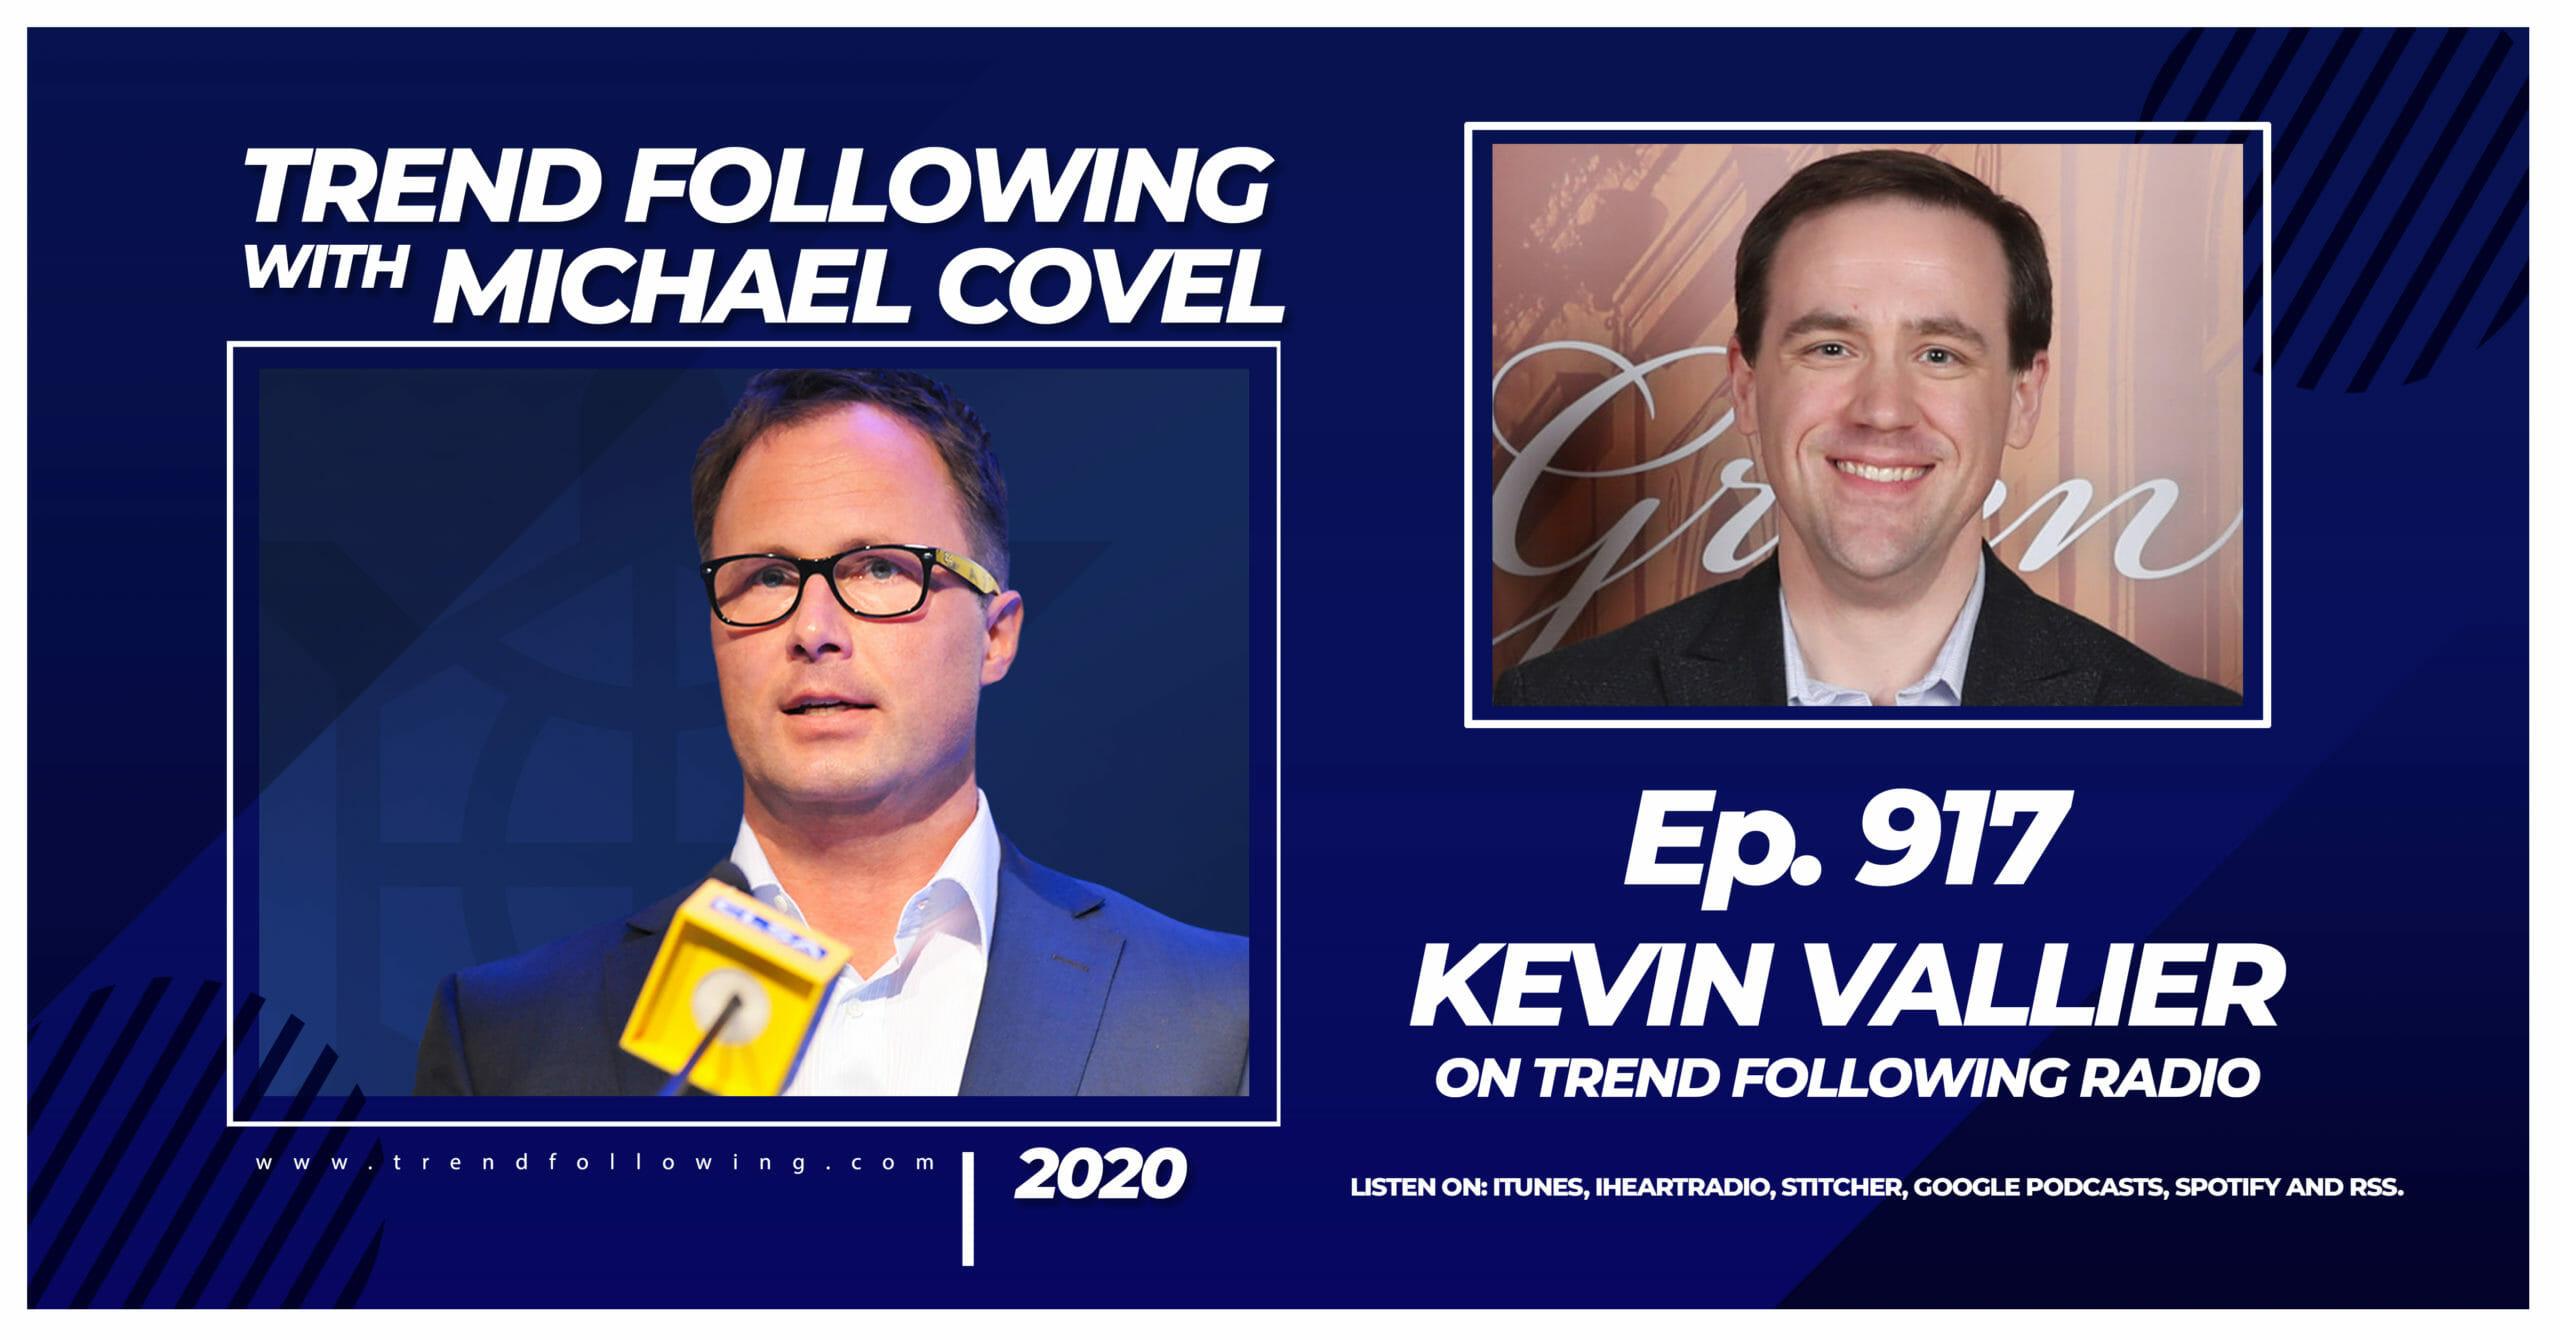 Kevin Vallier